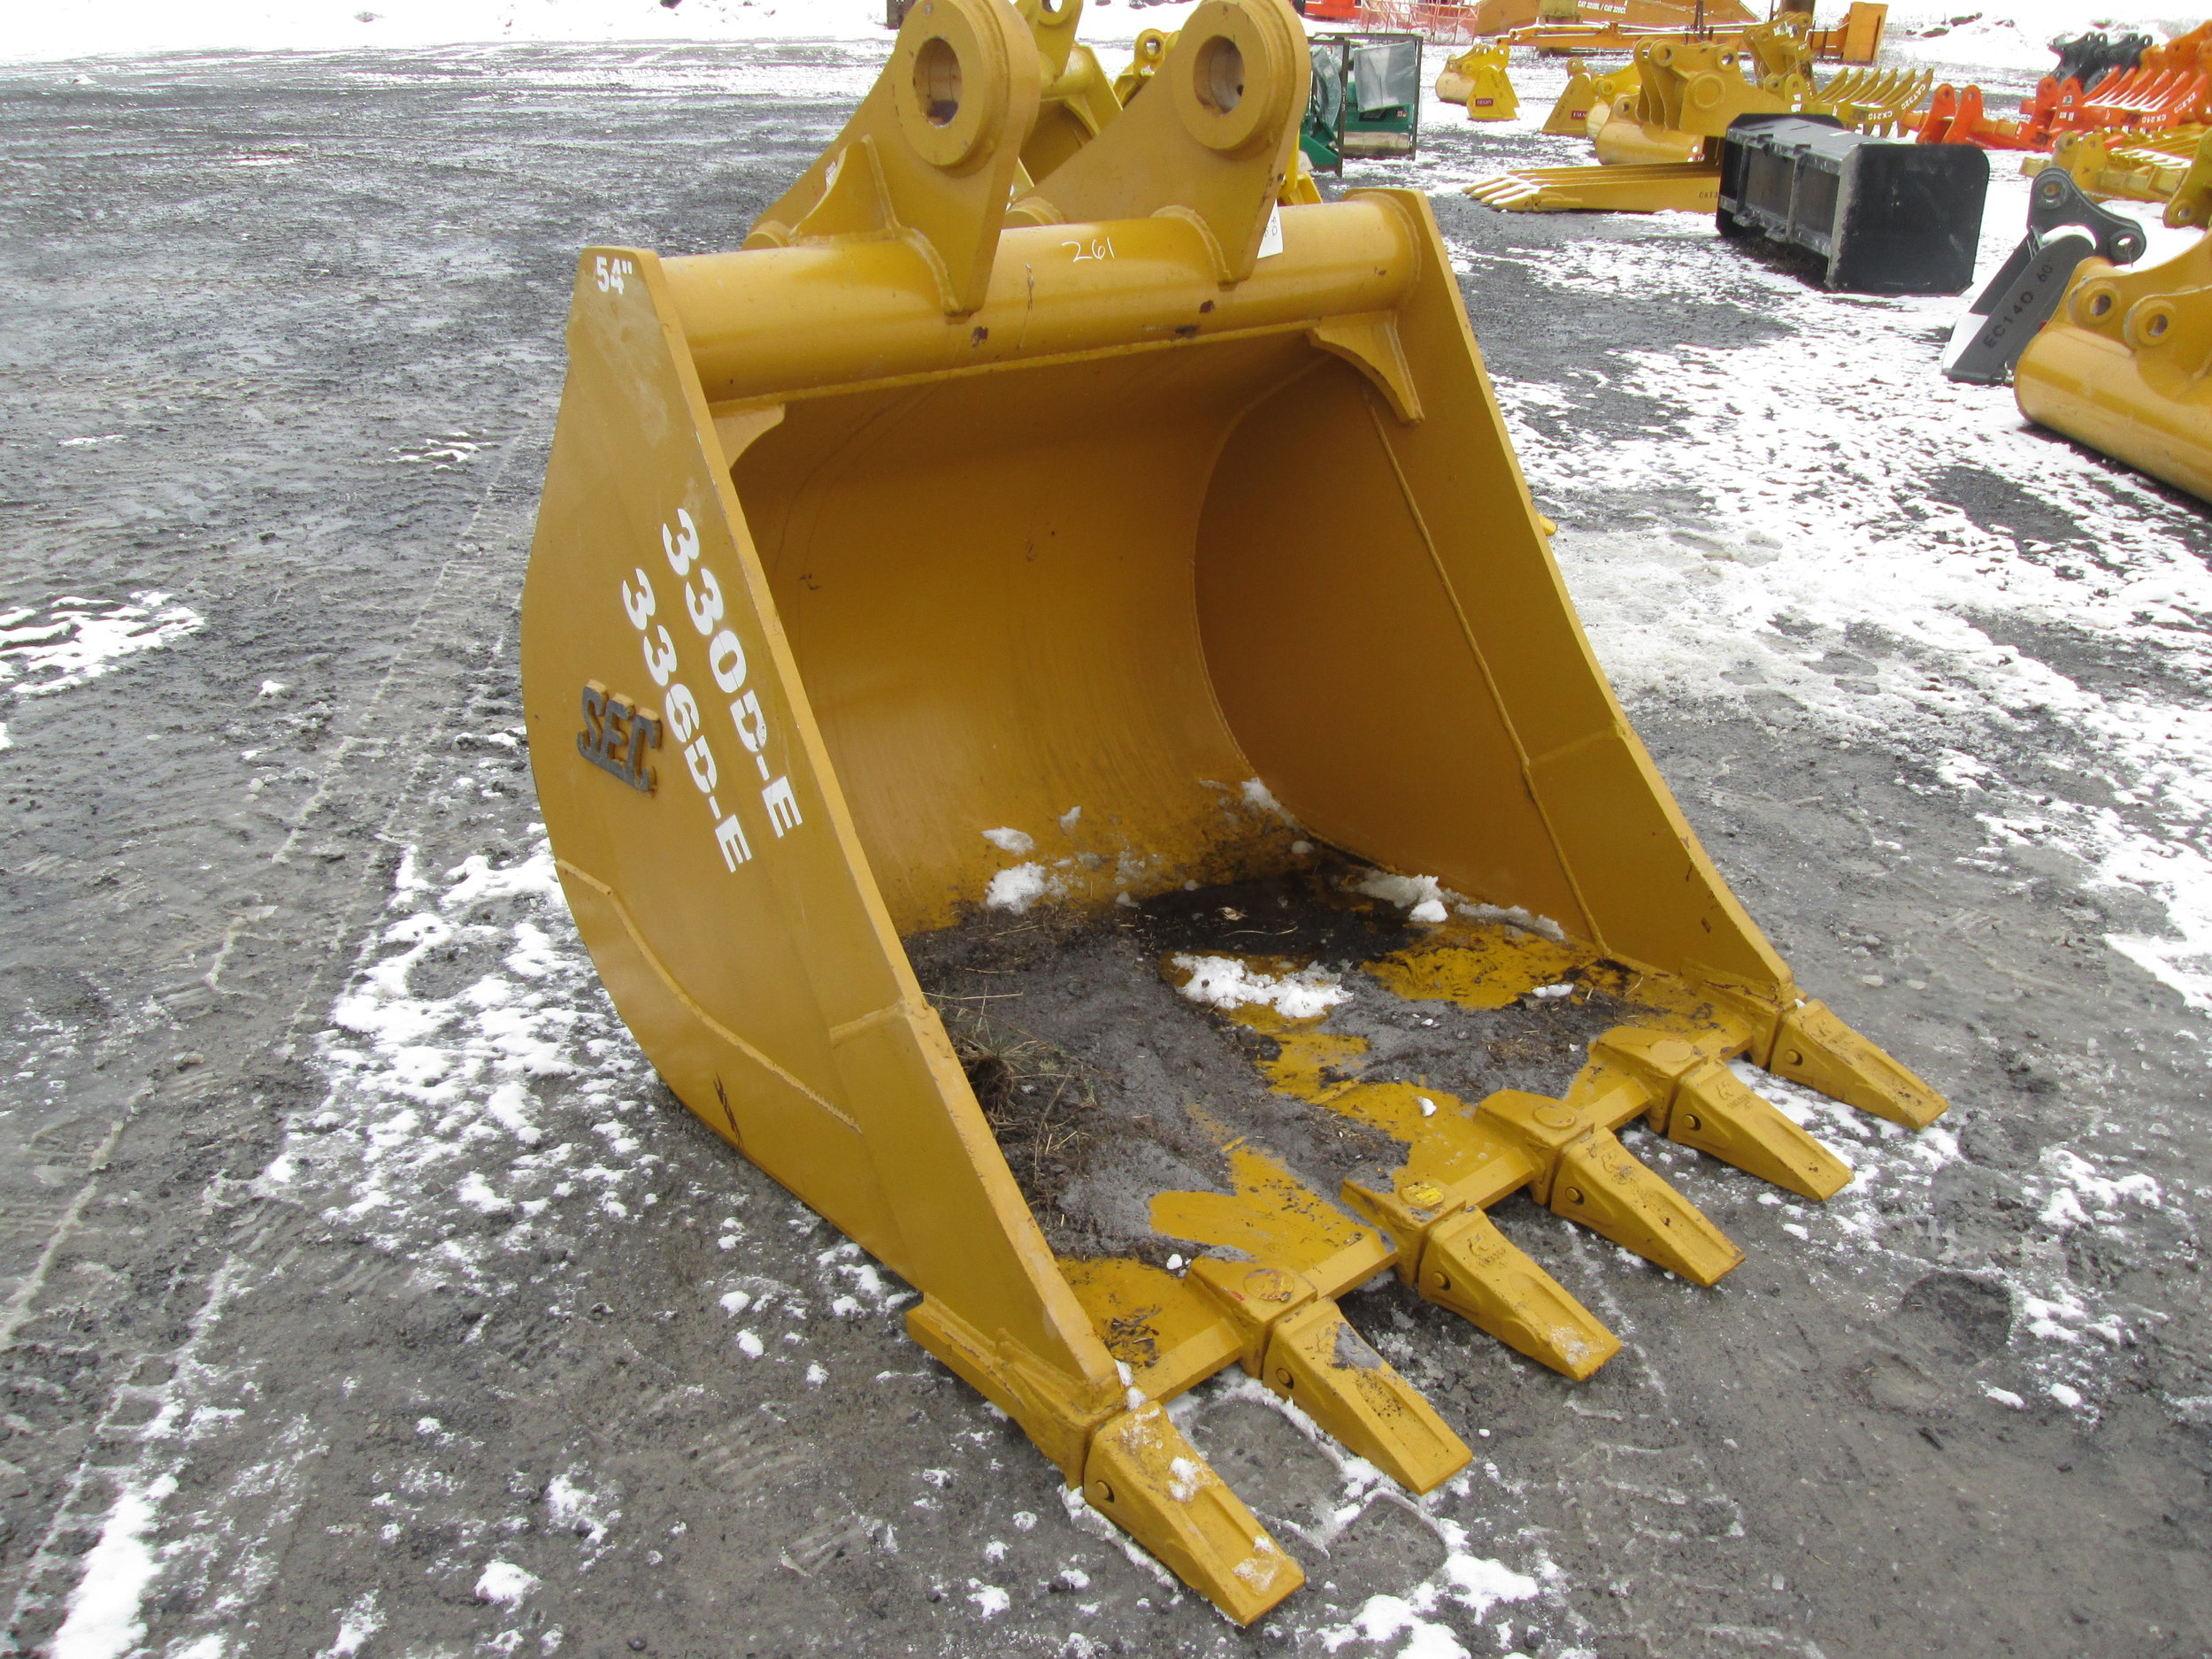 7969 sec 54 cat 330d 330dl carroll equipment syracuse s best place for construction equipment [ 1500 x 1125 Pixel ]